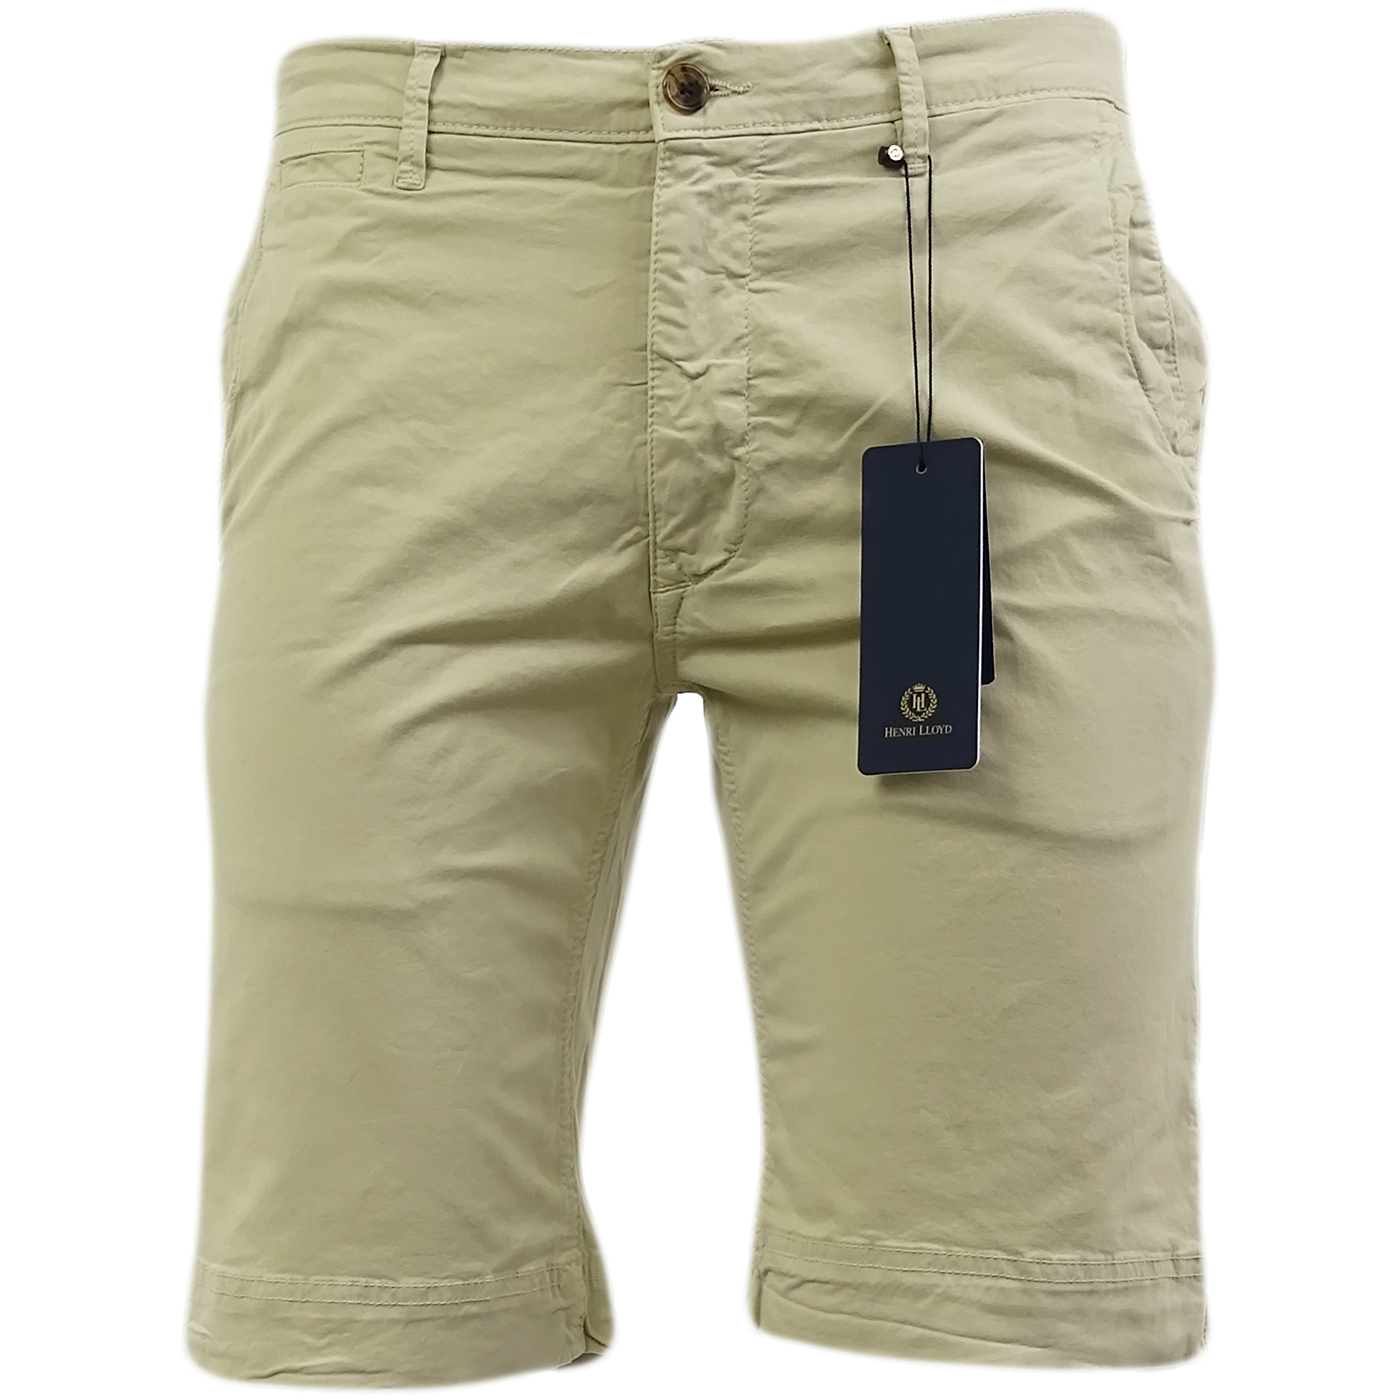 Henri Lloyd Plain Smart Chino Shorts - Garn